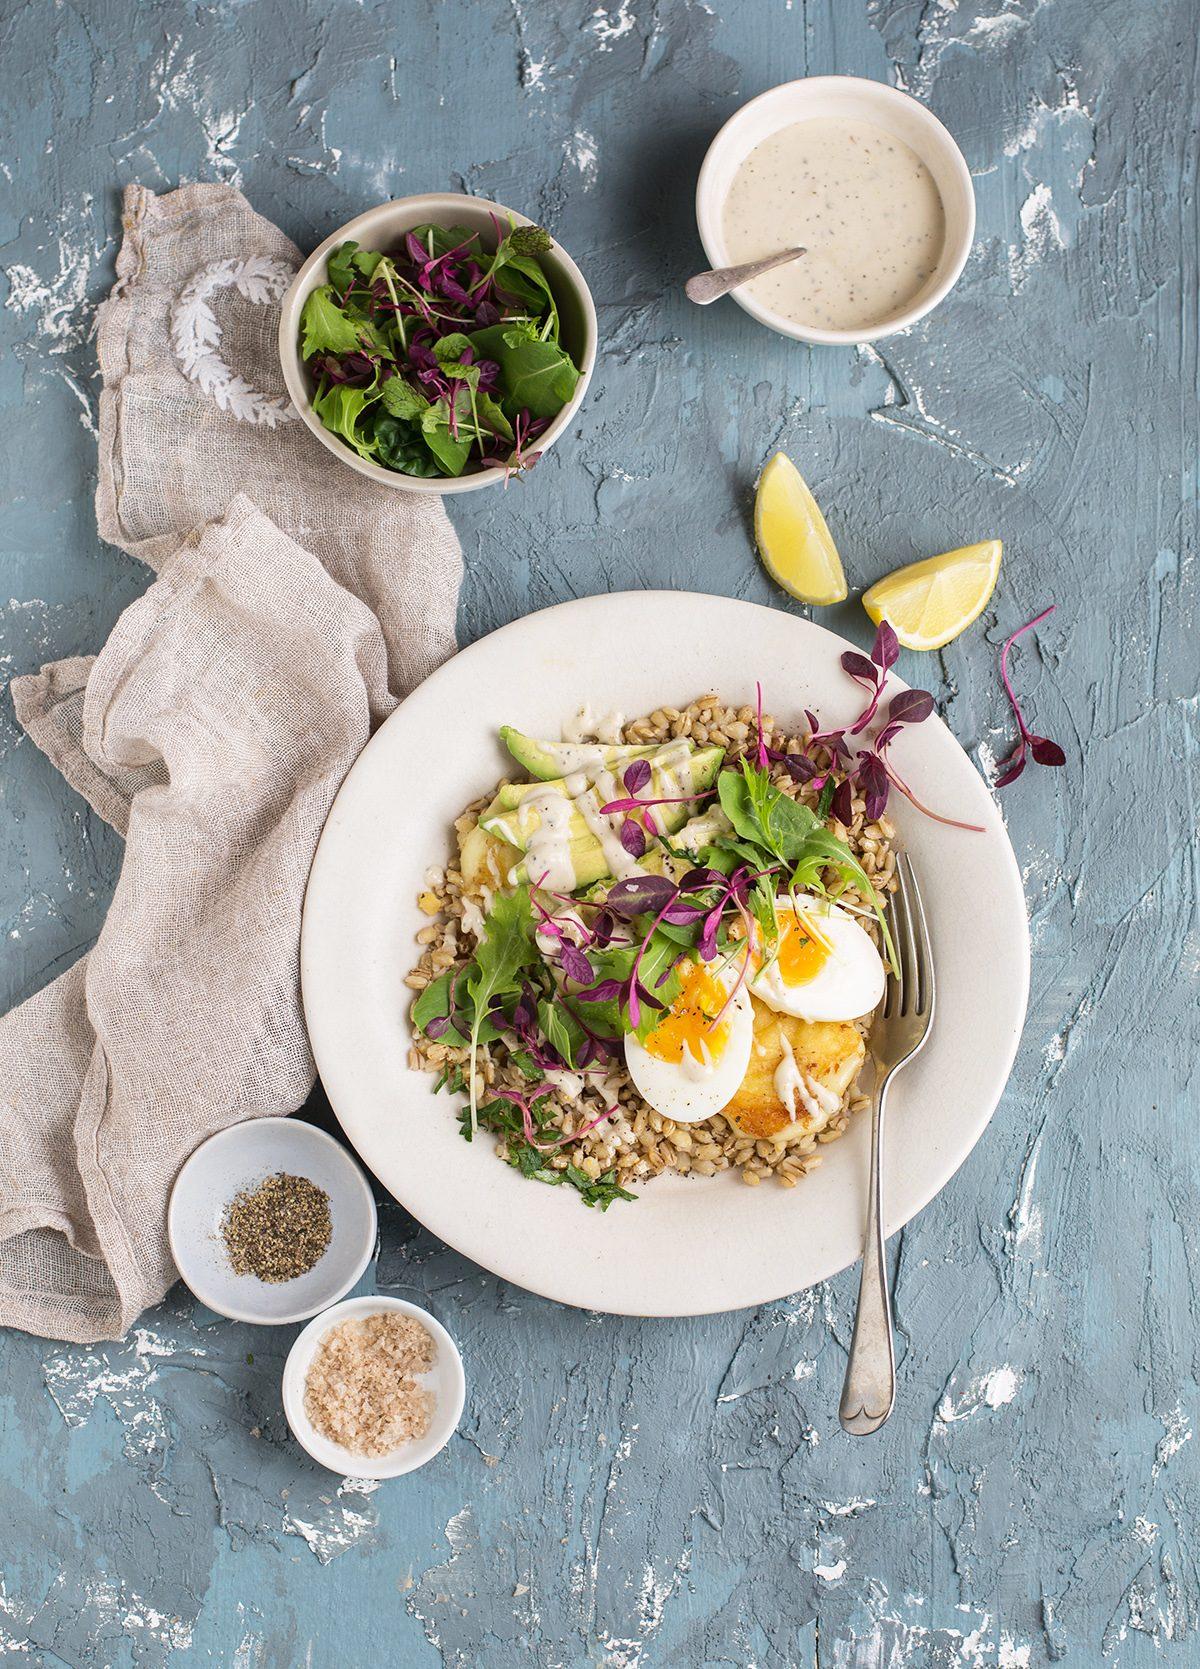 barley breakfast bowl with halloumi, avocado, egg & tahini dressing